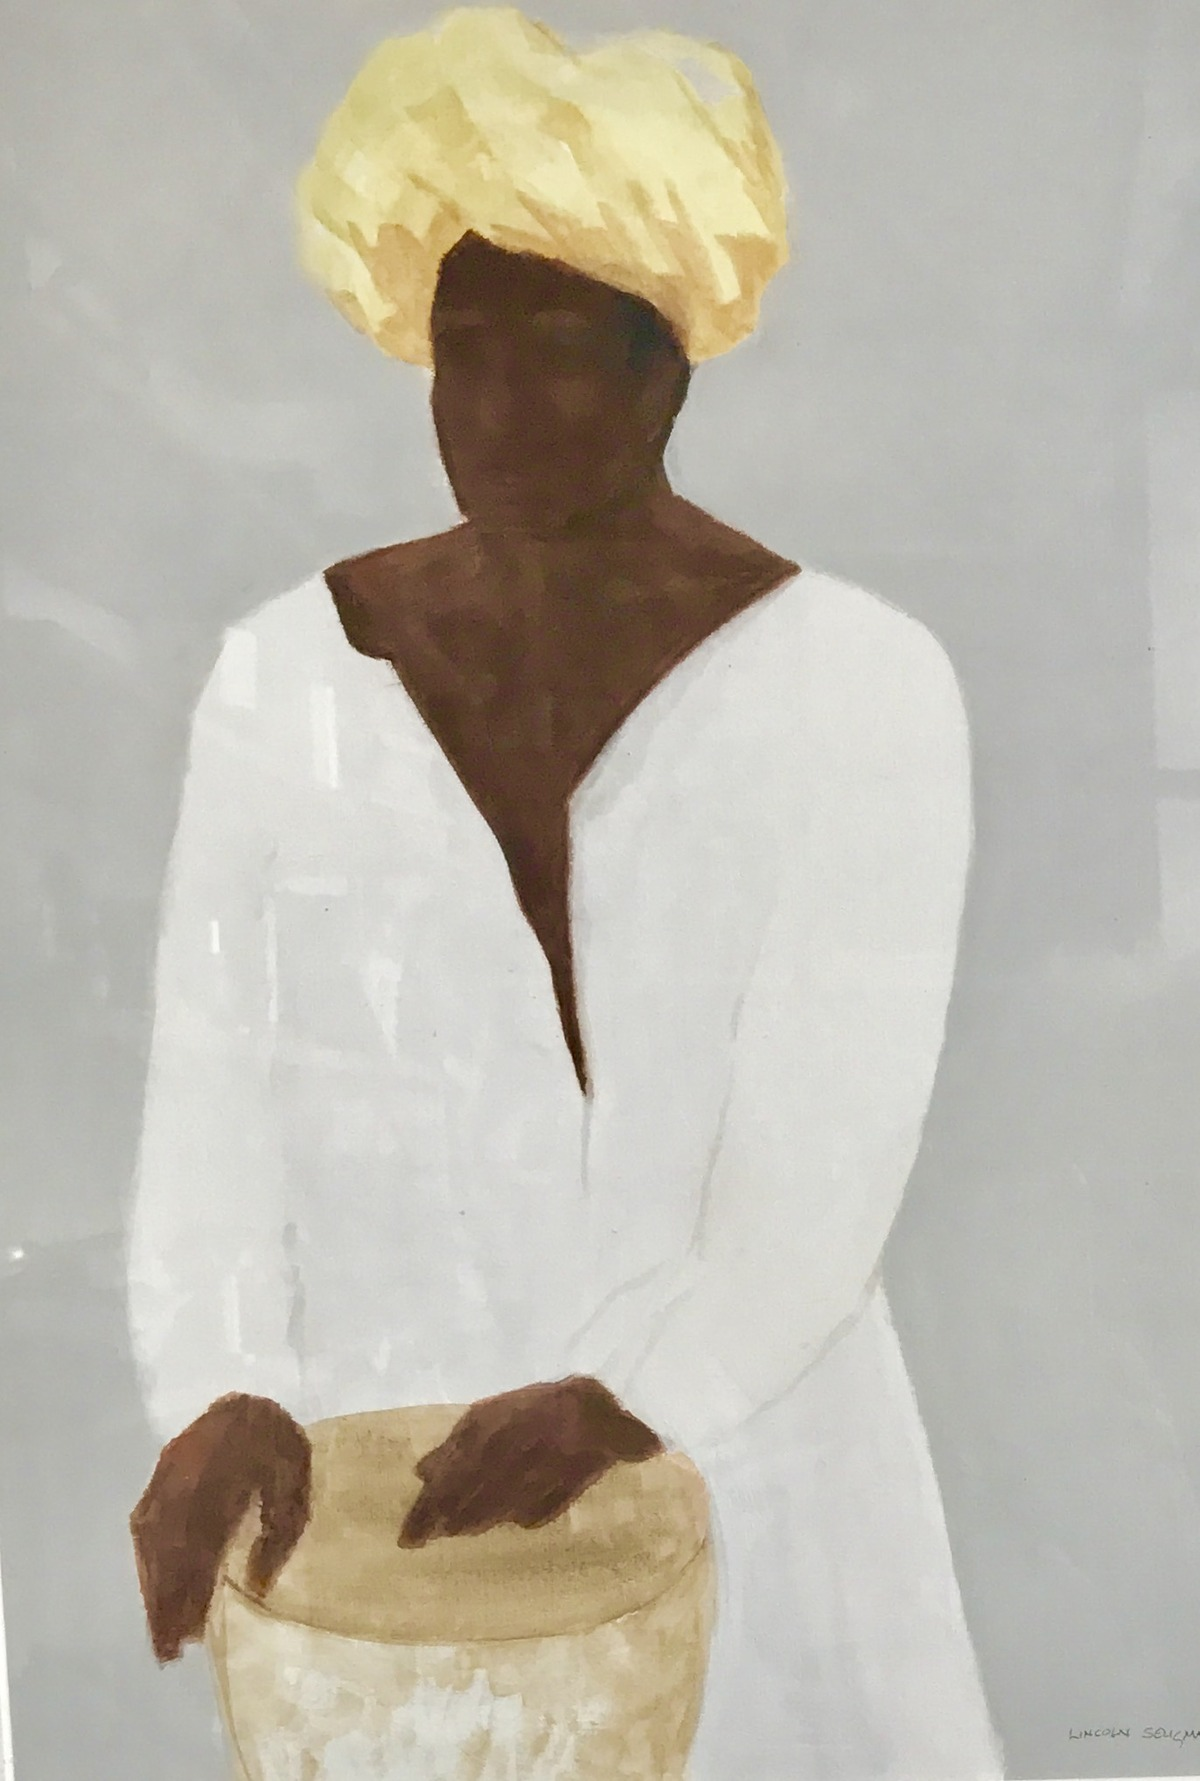 Drummer, yellow turban